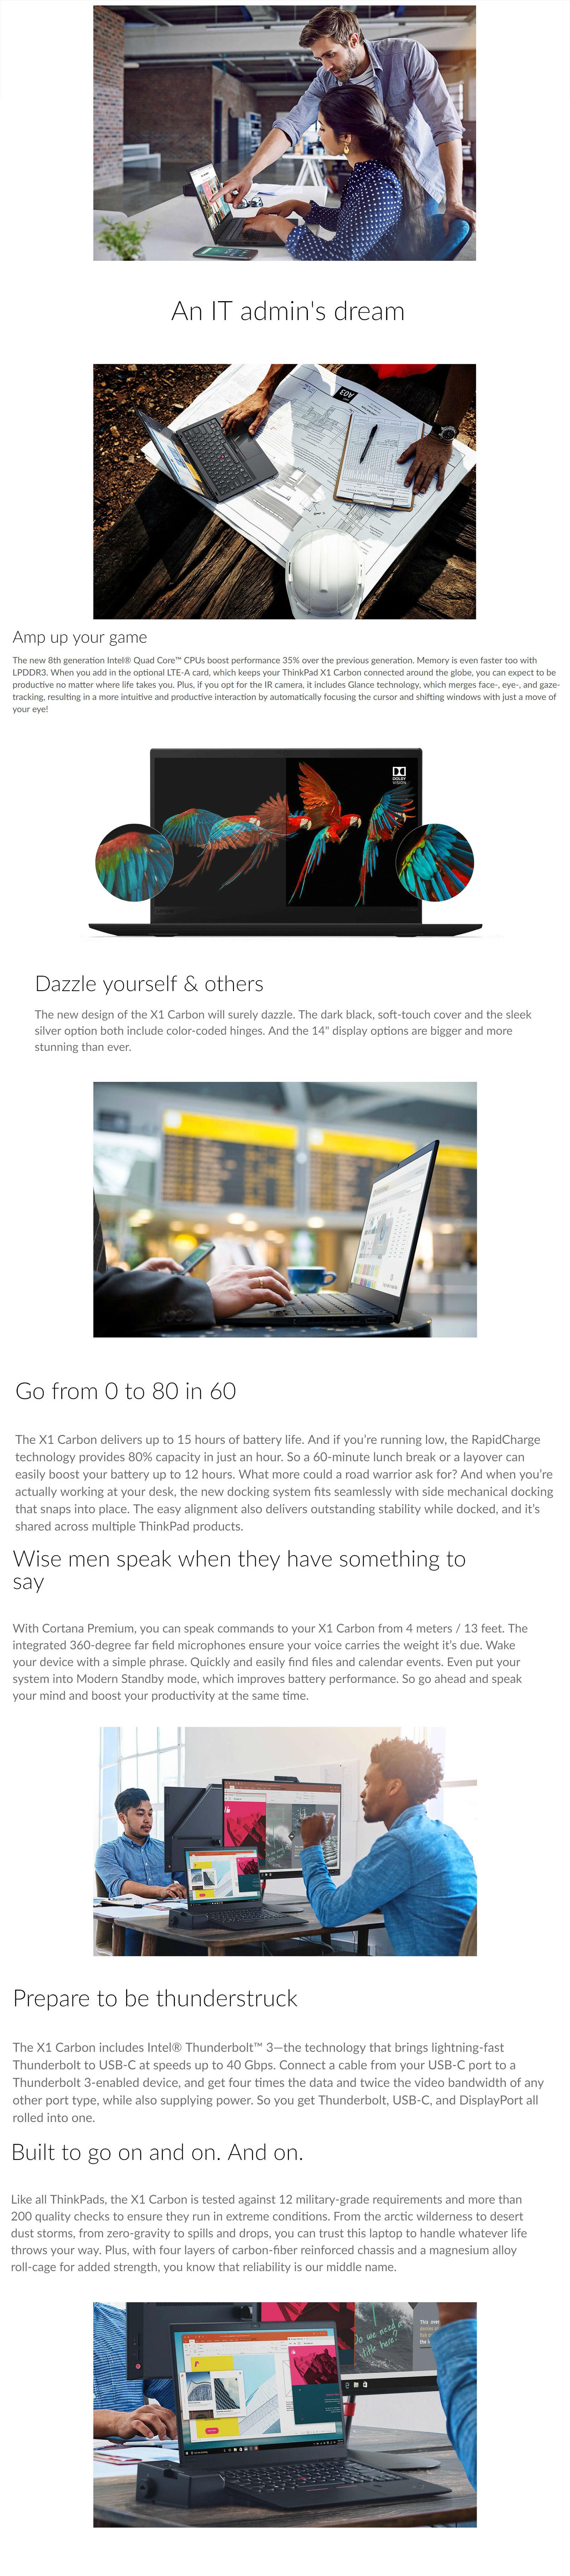 Lenovo ThinkPad X1 Carbon G6 14in FHD IPS i7 8550U 256GB SSD Laptop  (20KHS1L200)